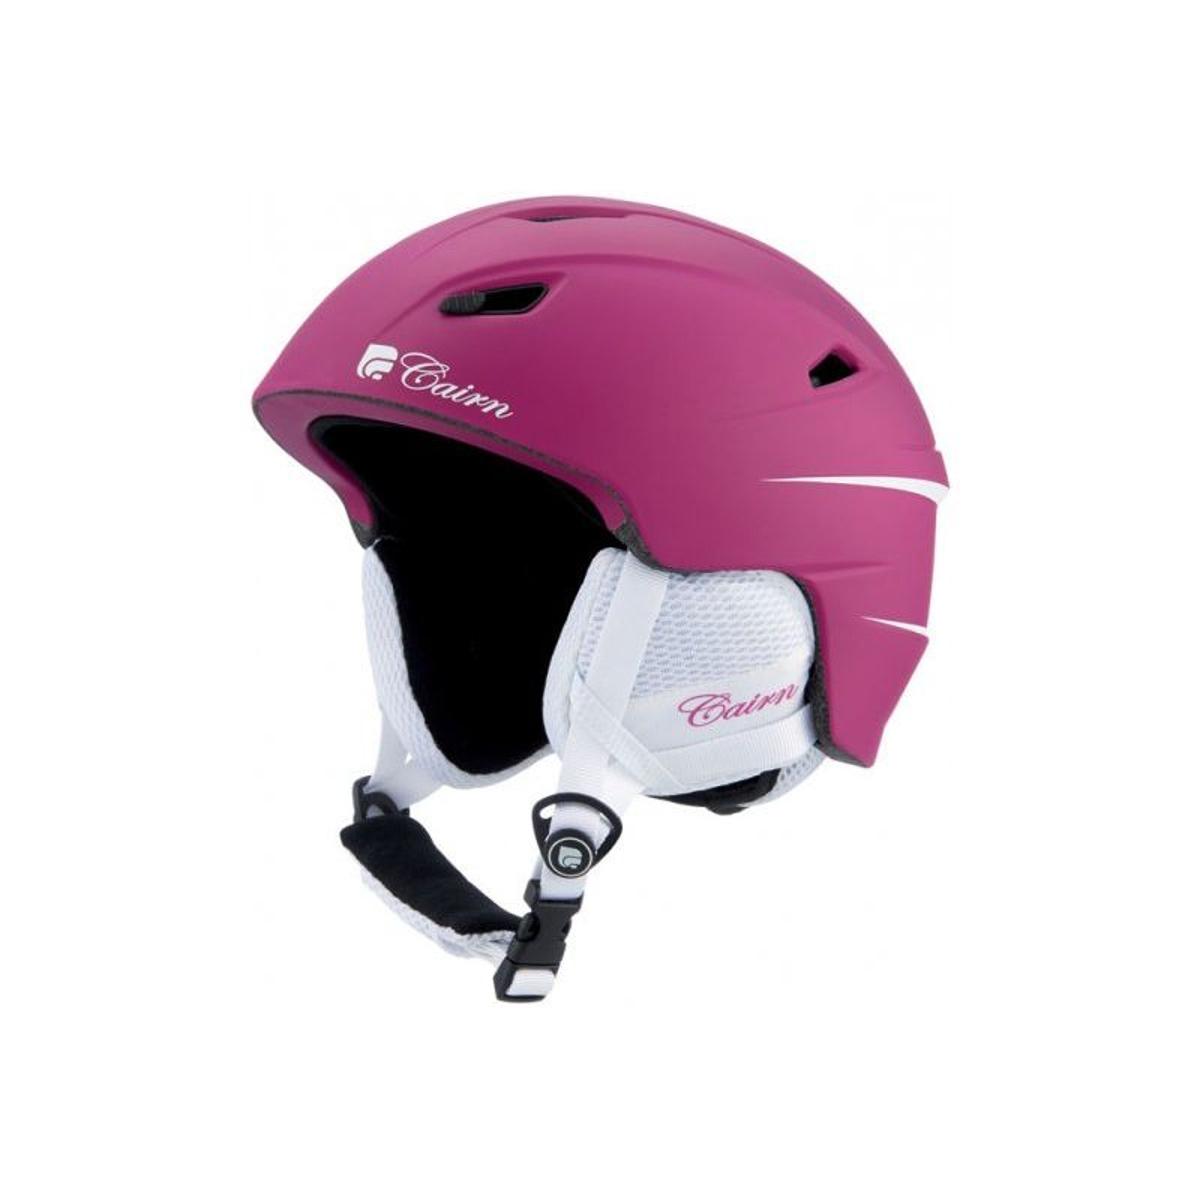 Casque de ski mixte CAIRN Rose ELECTRON U Cranberry Mat 57/58